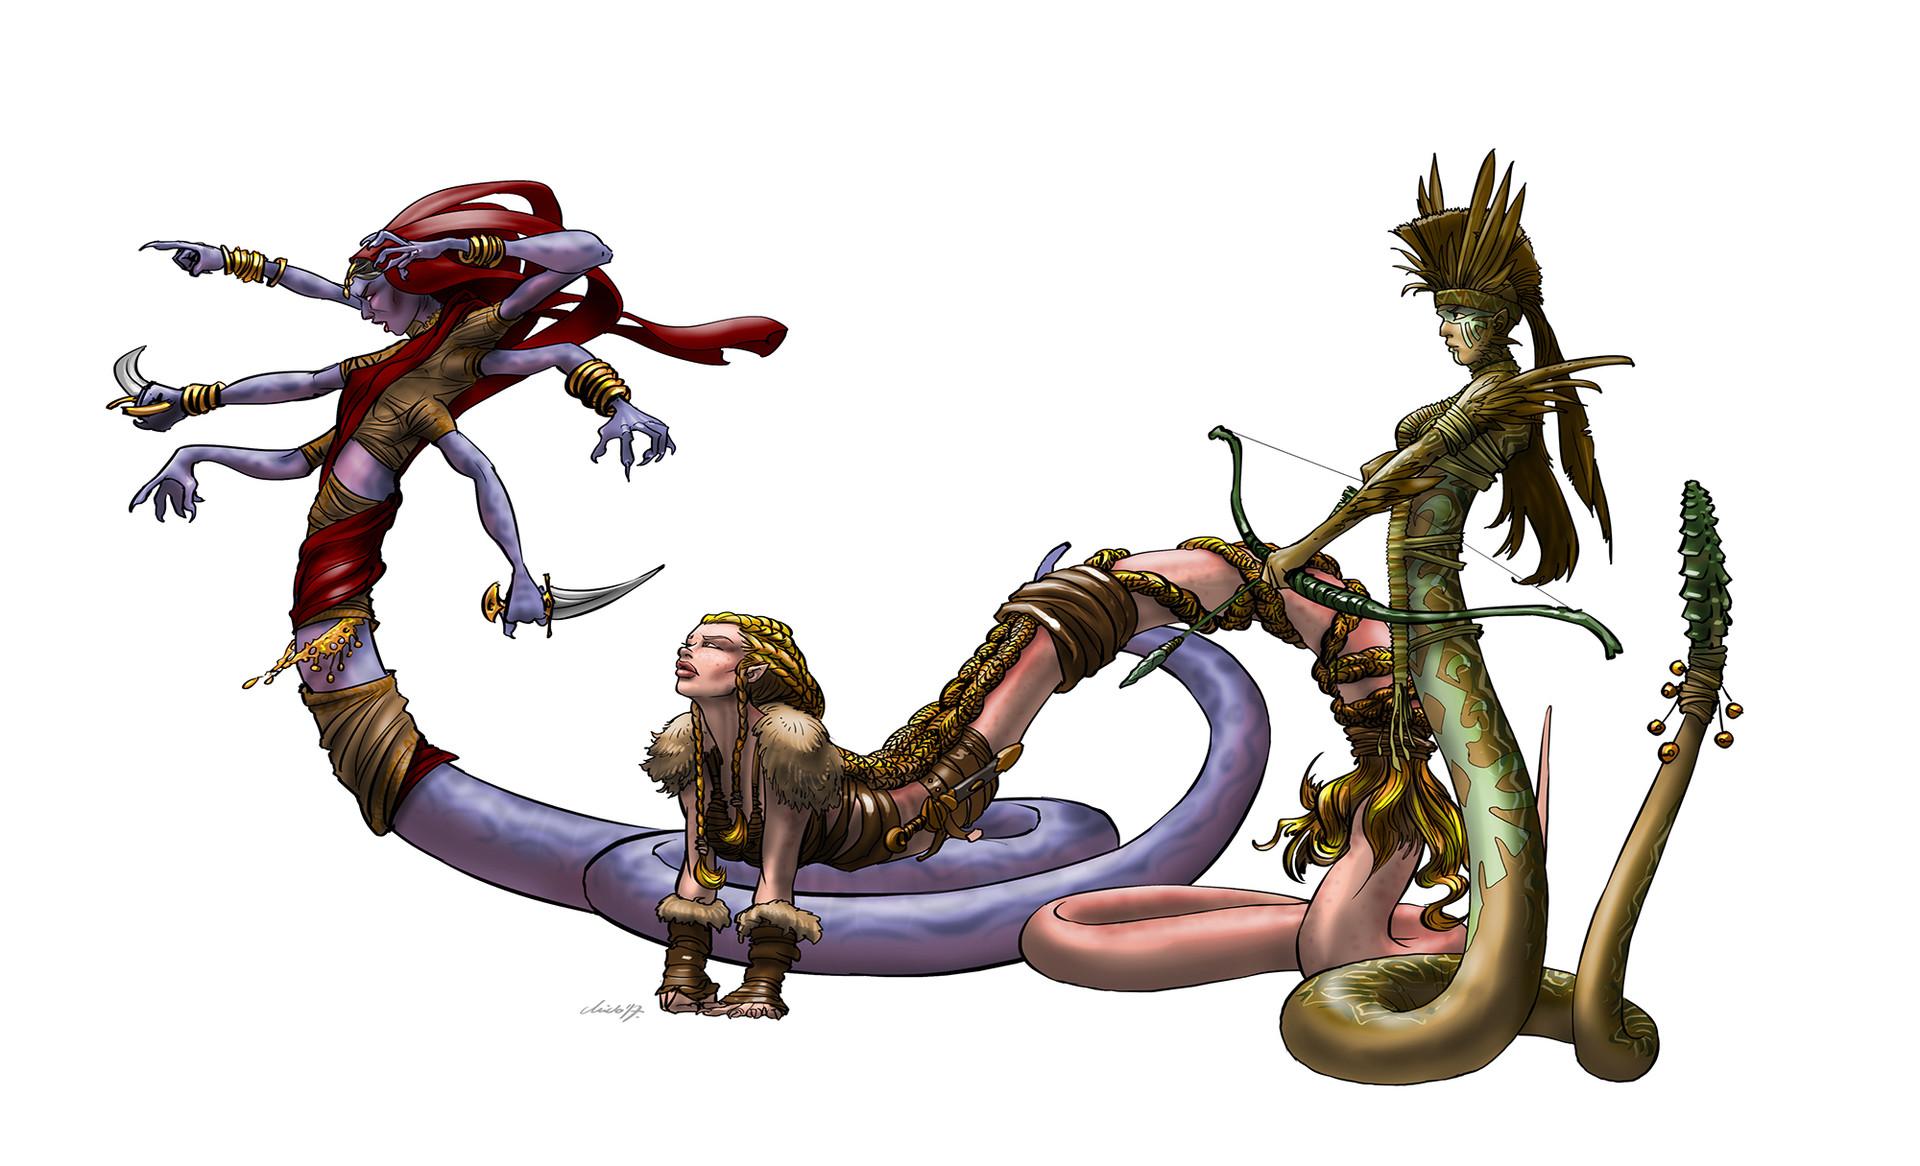 Midhat kapetanovic gorgon retroevolution 01